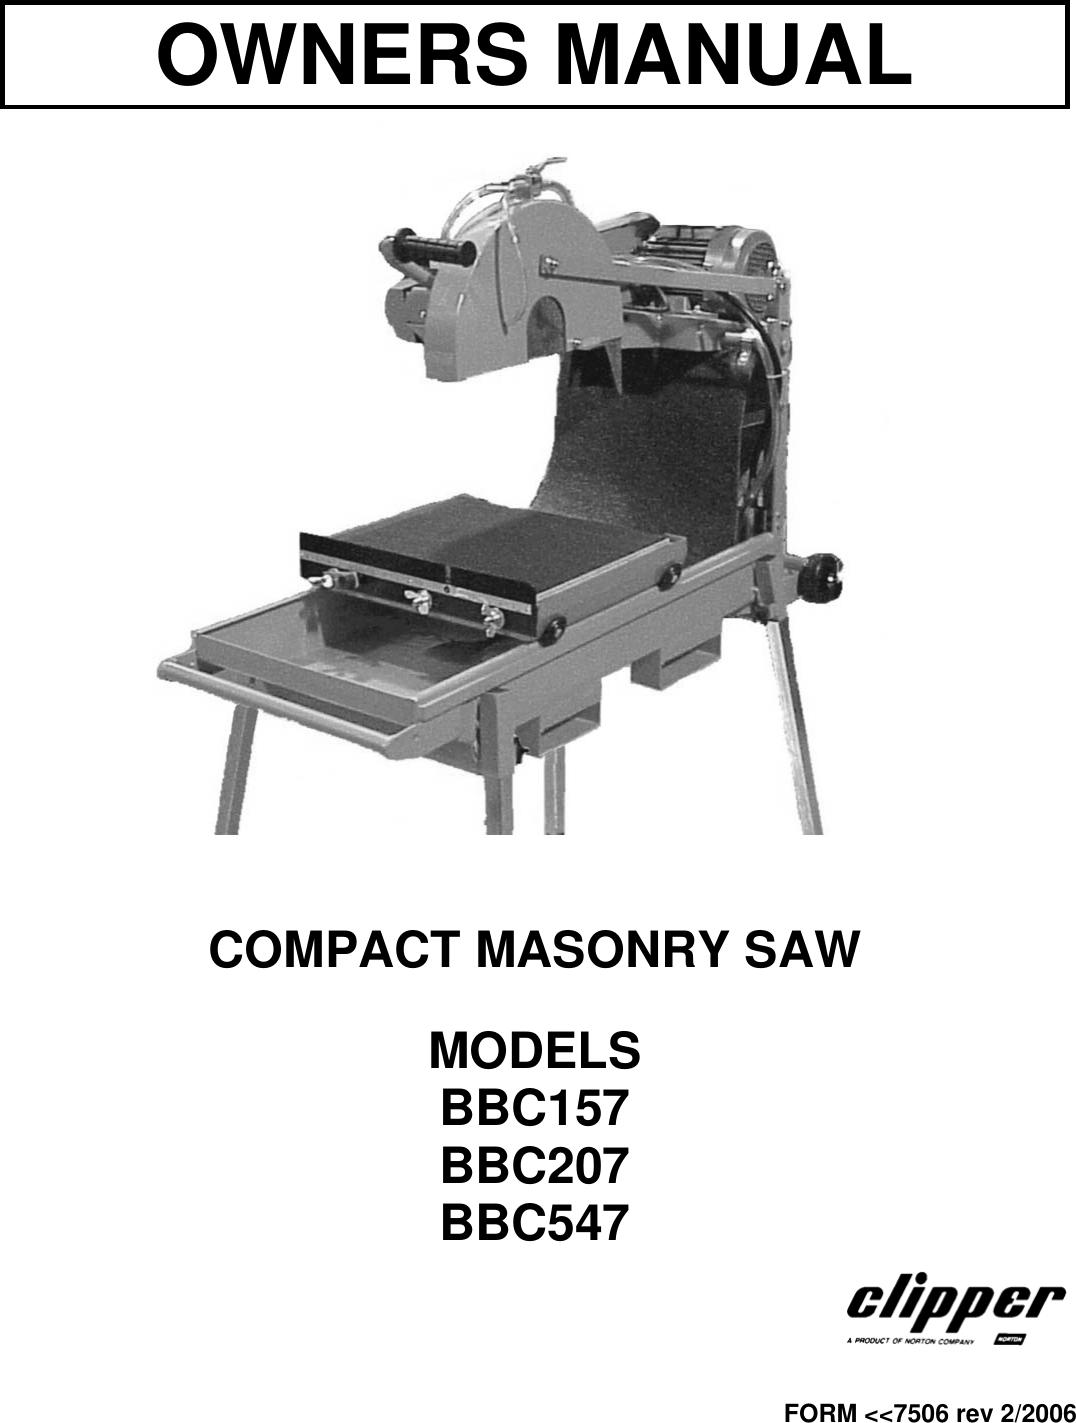 Norton Clipper Wiring Diagram Trusted Diagrams Abrasives Compact Masonry Saw Bbc157 Users Manual Bbc547 Rev Whelen Light Bar